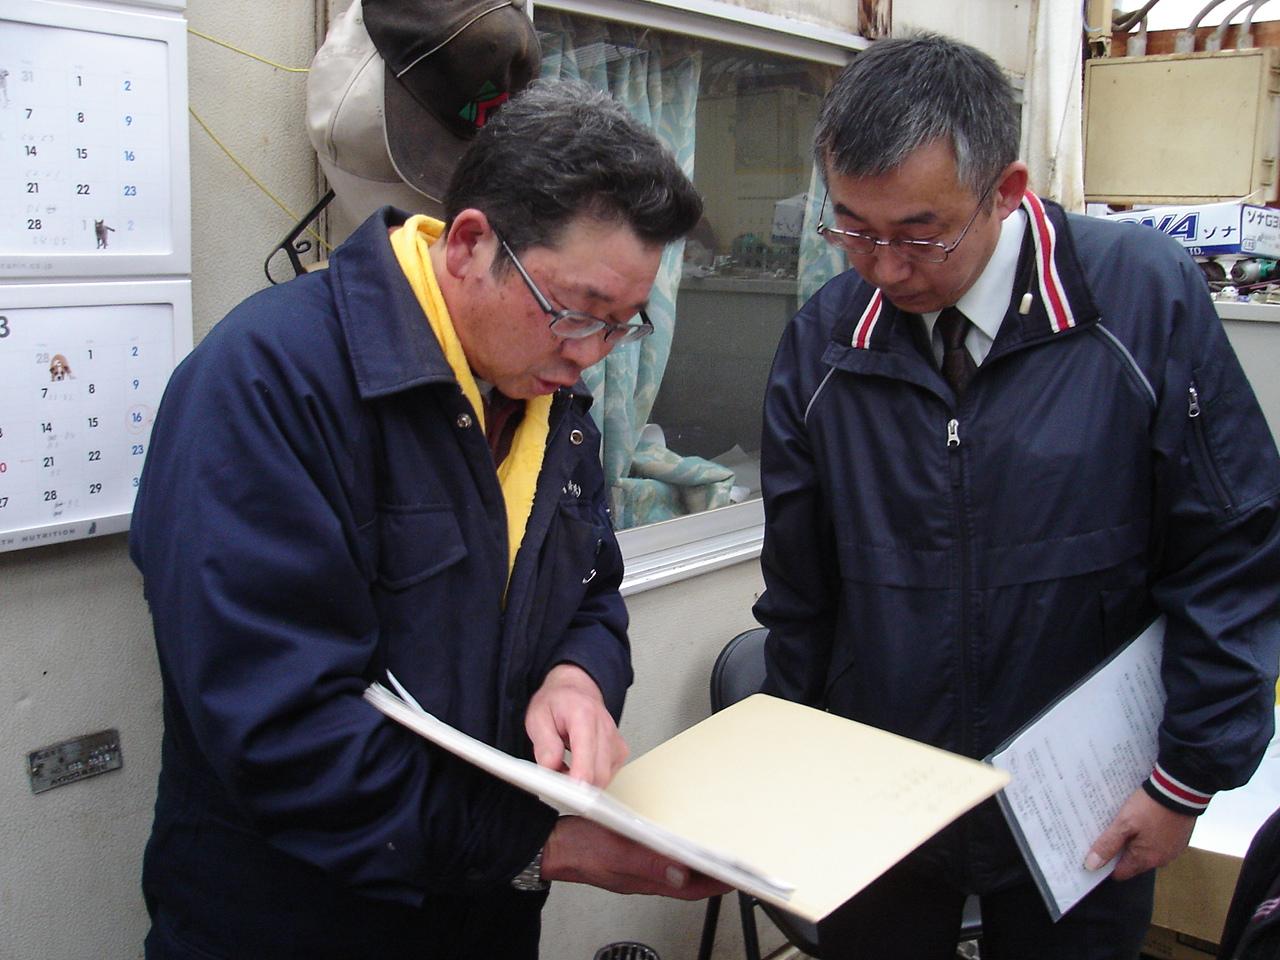 http://www.ucoop.or.jp/shouhin/shoku_shokuryo/sanchi/files/130327miya.JPG